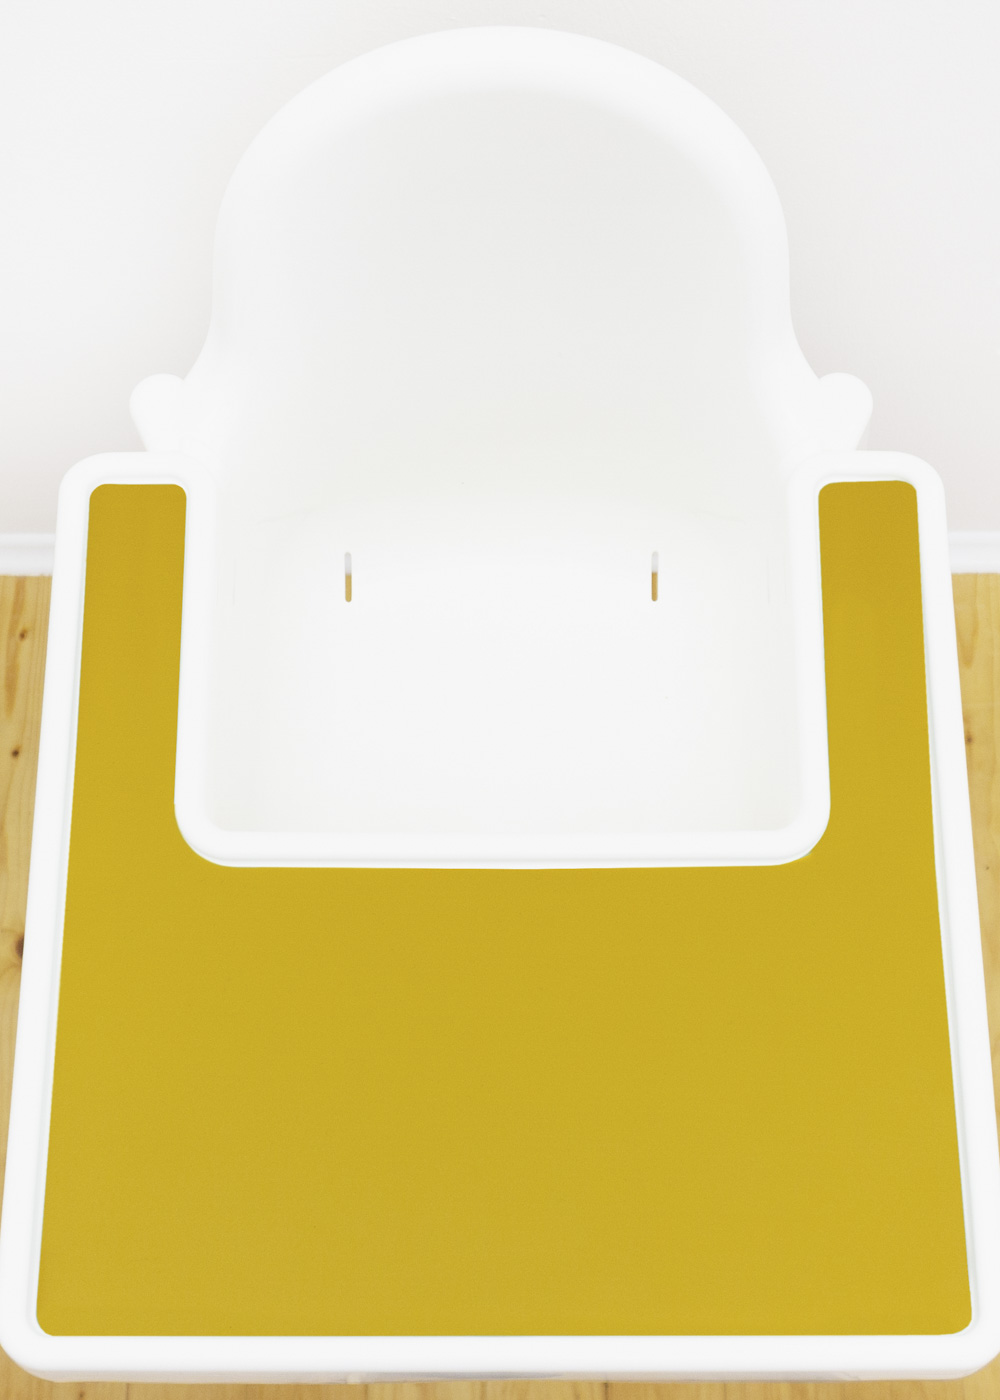 Silikonmatte Ikea Antilop Hochstuhl Klecka Mat senf Gesamtansicht schräg oben